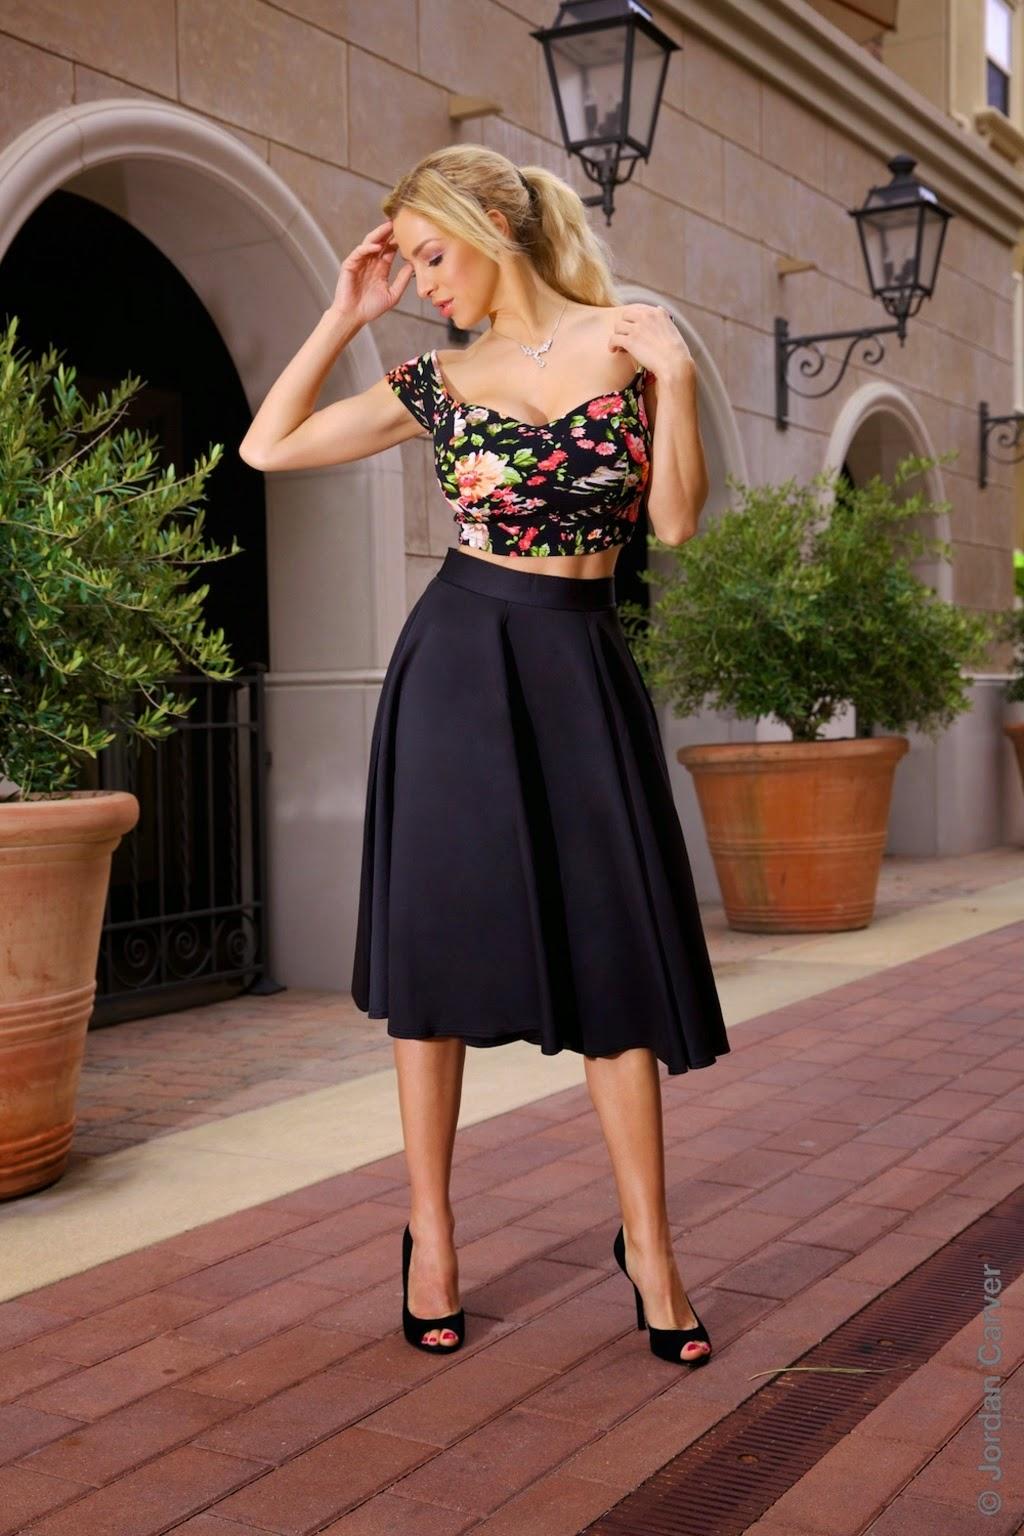 Jordan Carver Hot Gorgeous In Black Dress Big Boobs